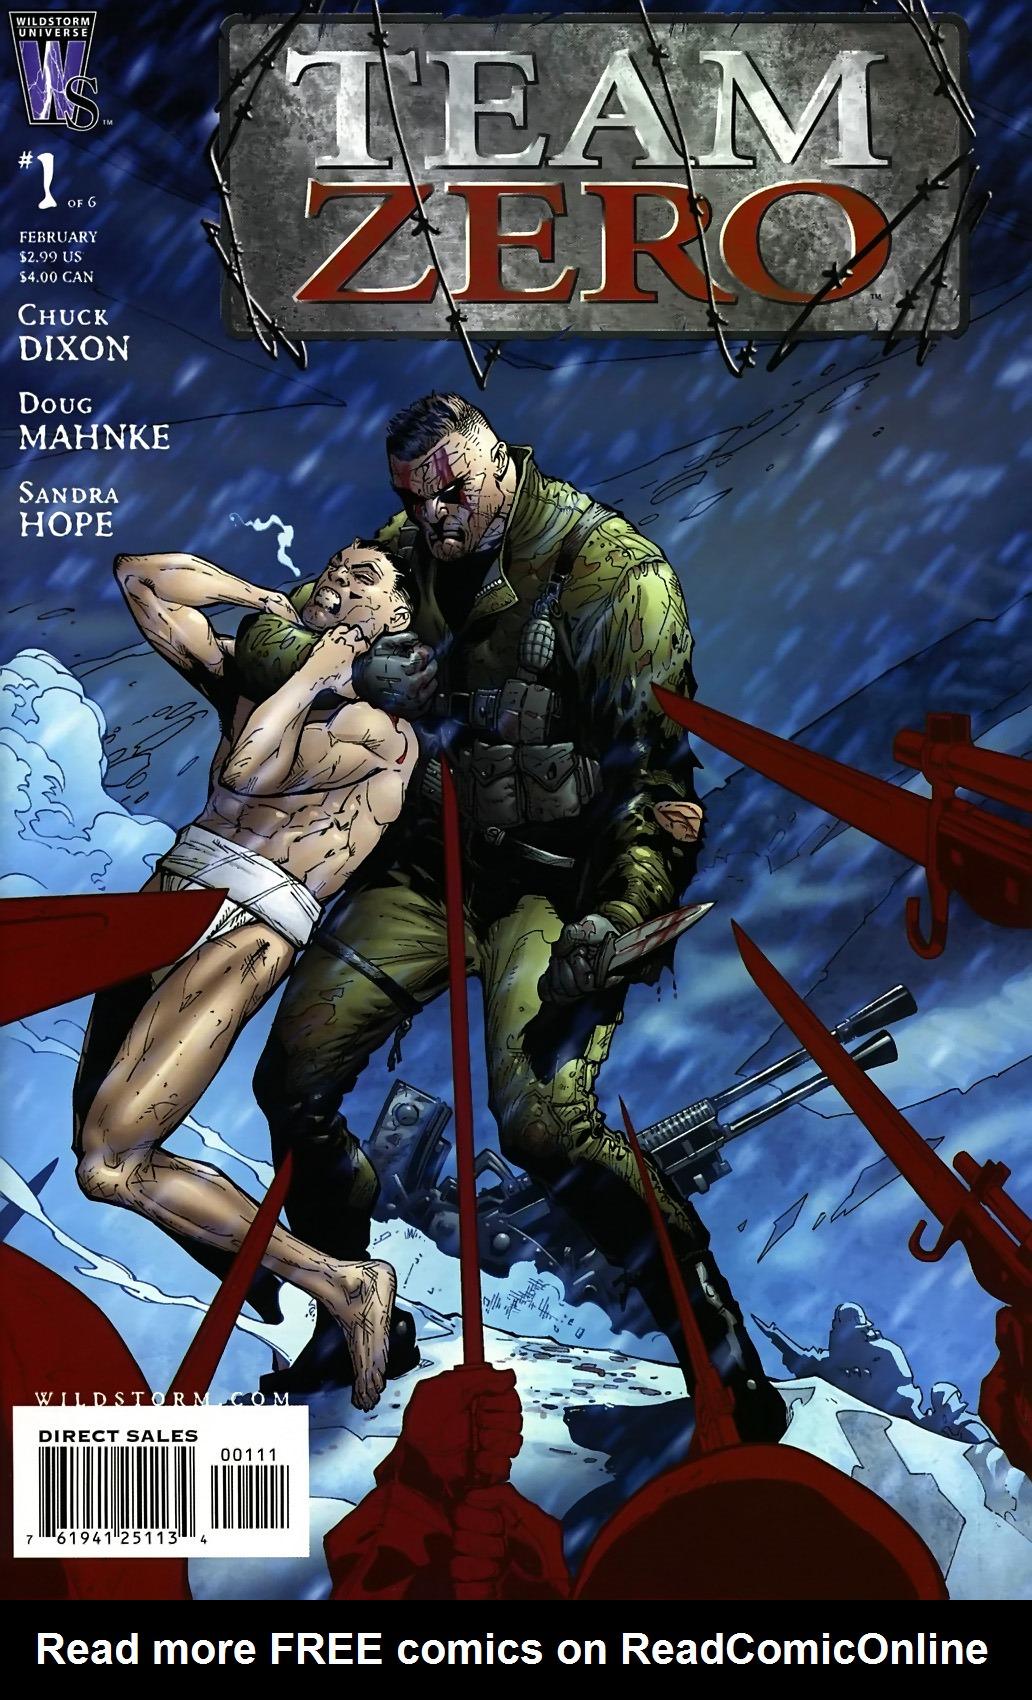 Read online Team Zero comic -  Issue #1 - 1